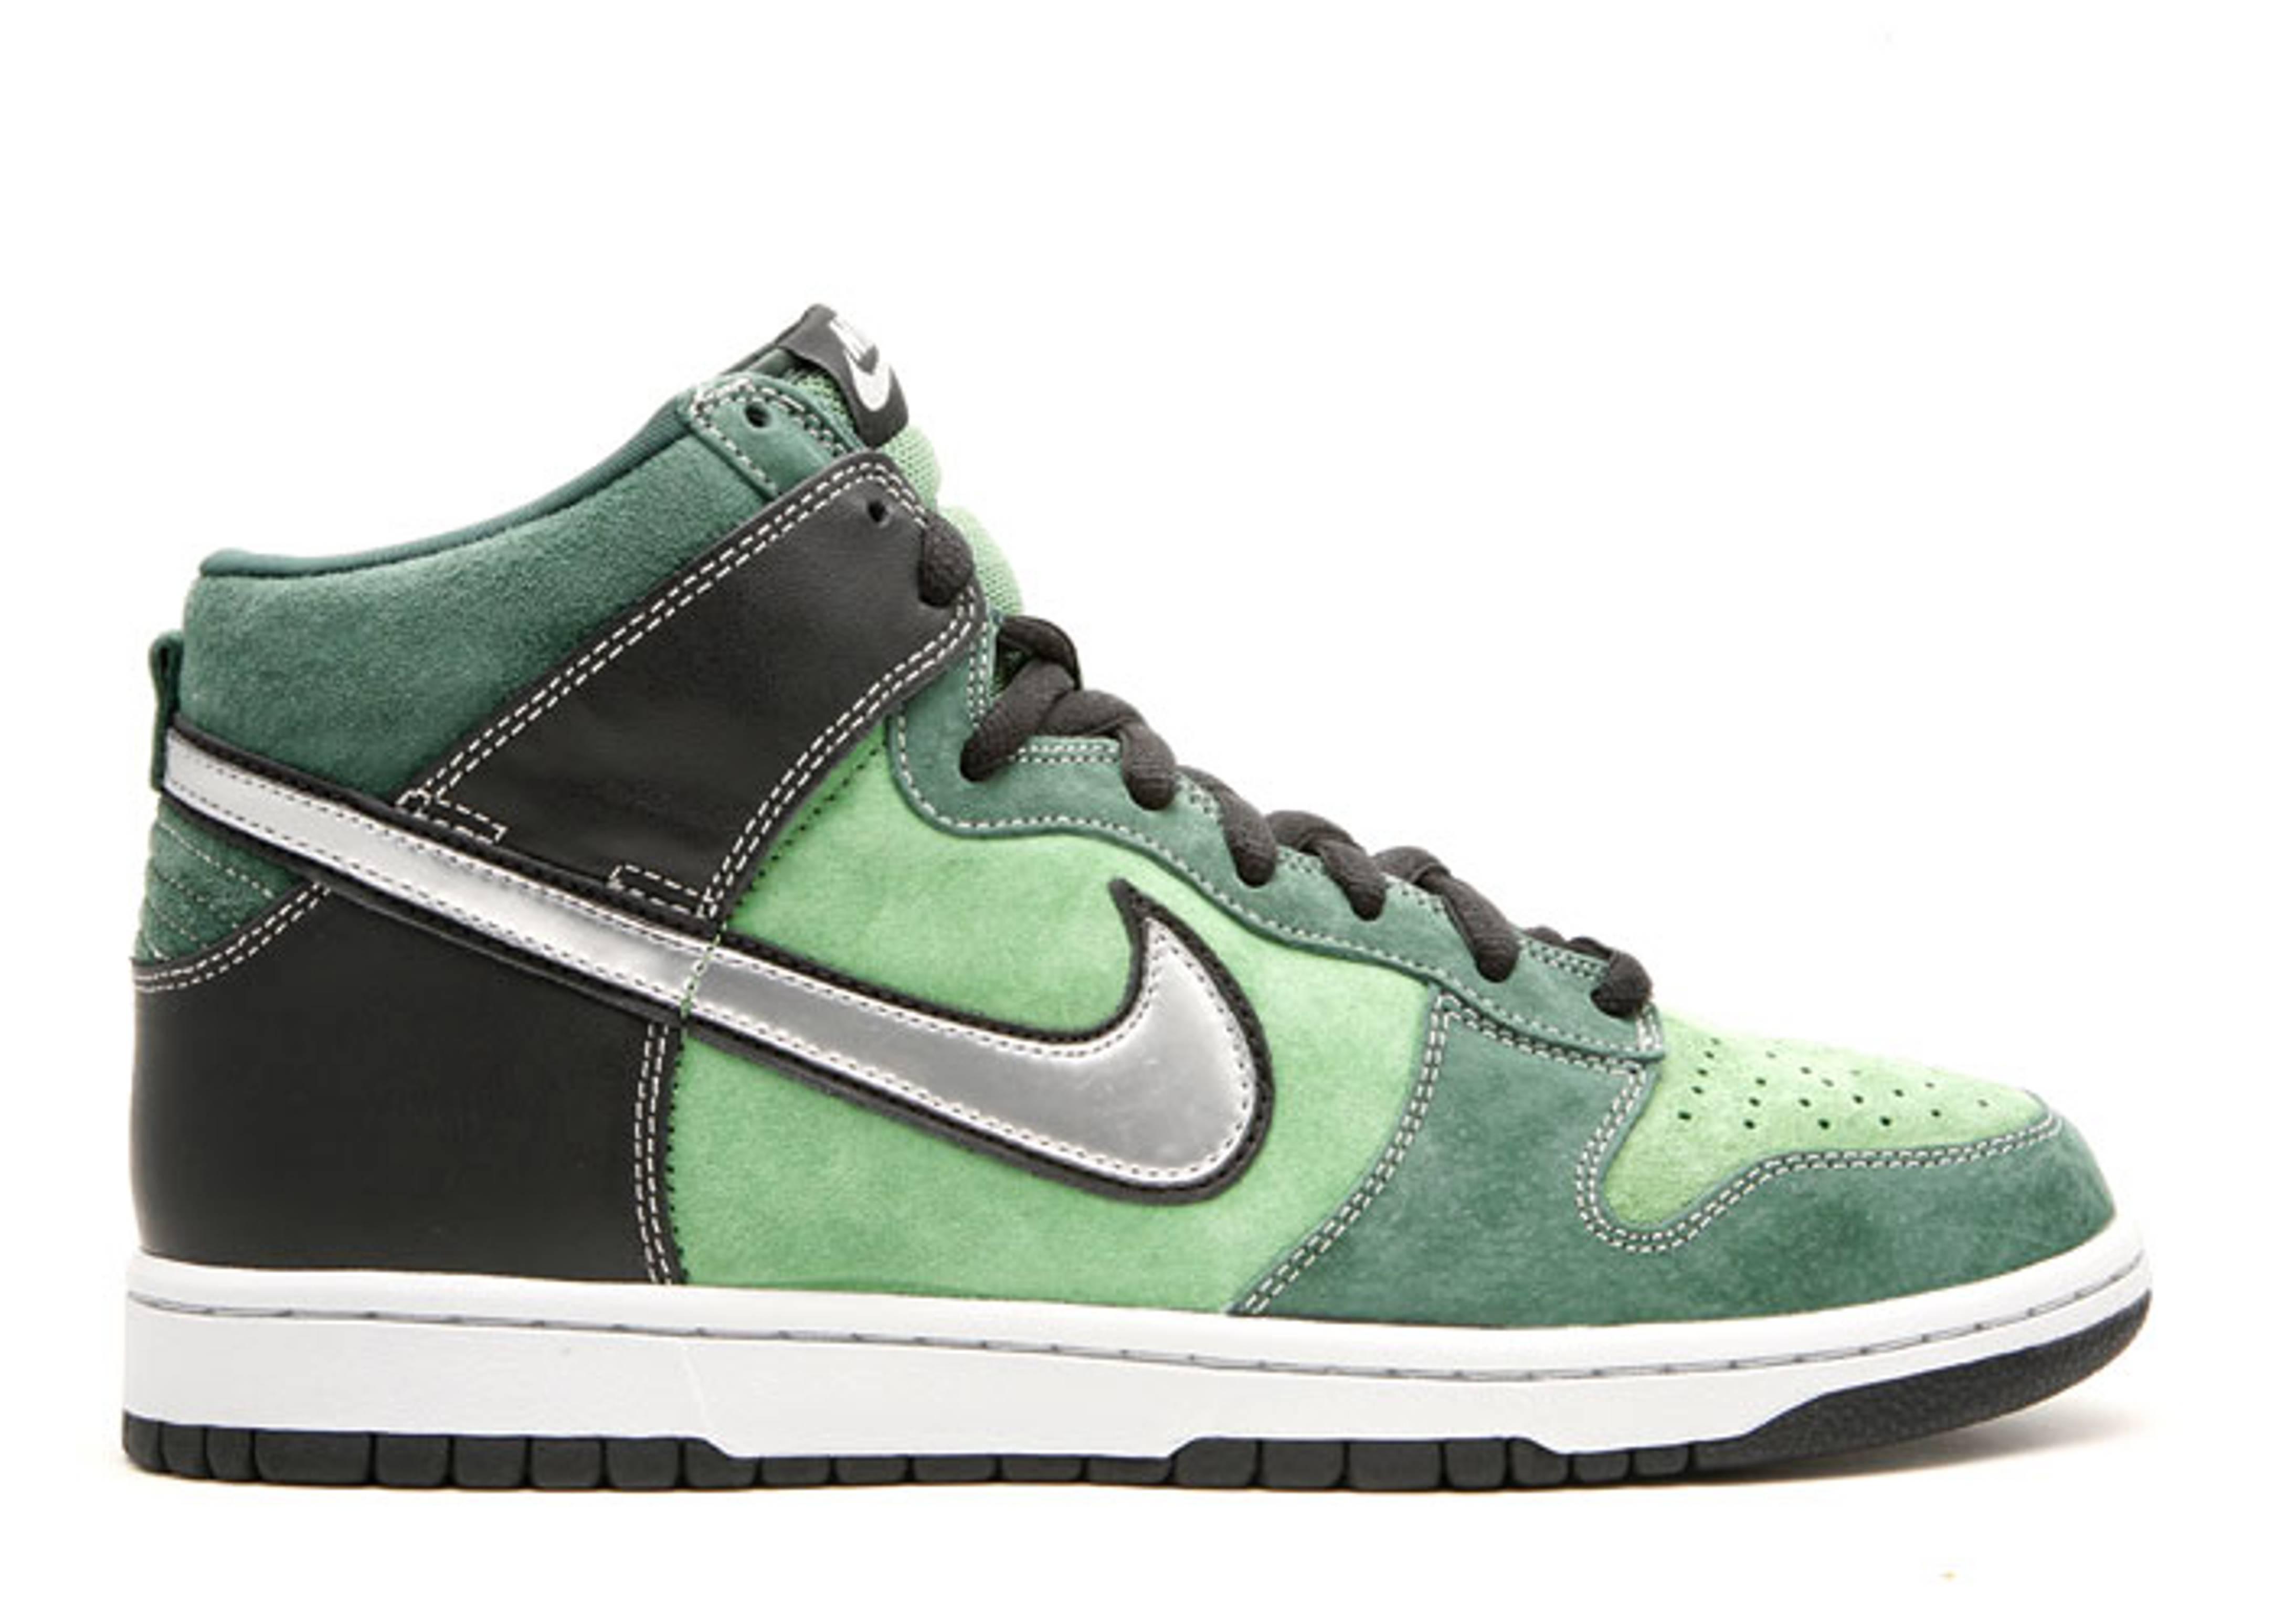 sports shoes 41476 03614 ... discount dunk high pro sb brut nike 305050 304 tomatillo metallic  silver flight club 5b370 713ce